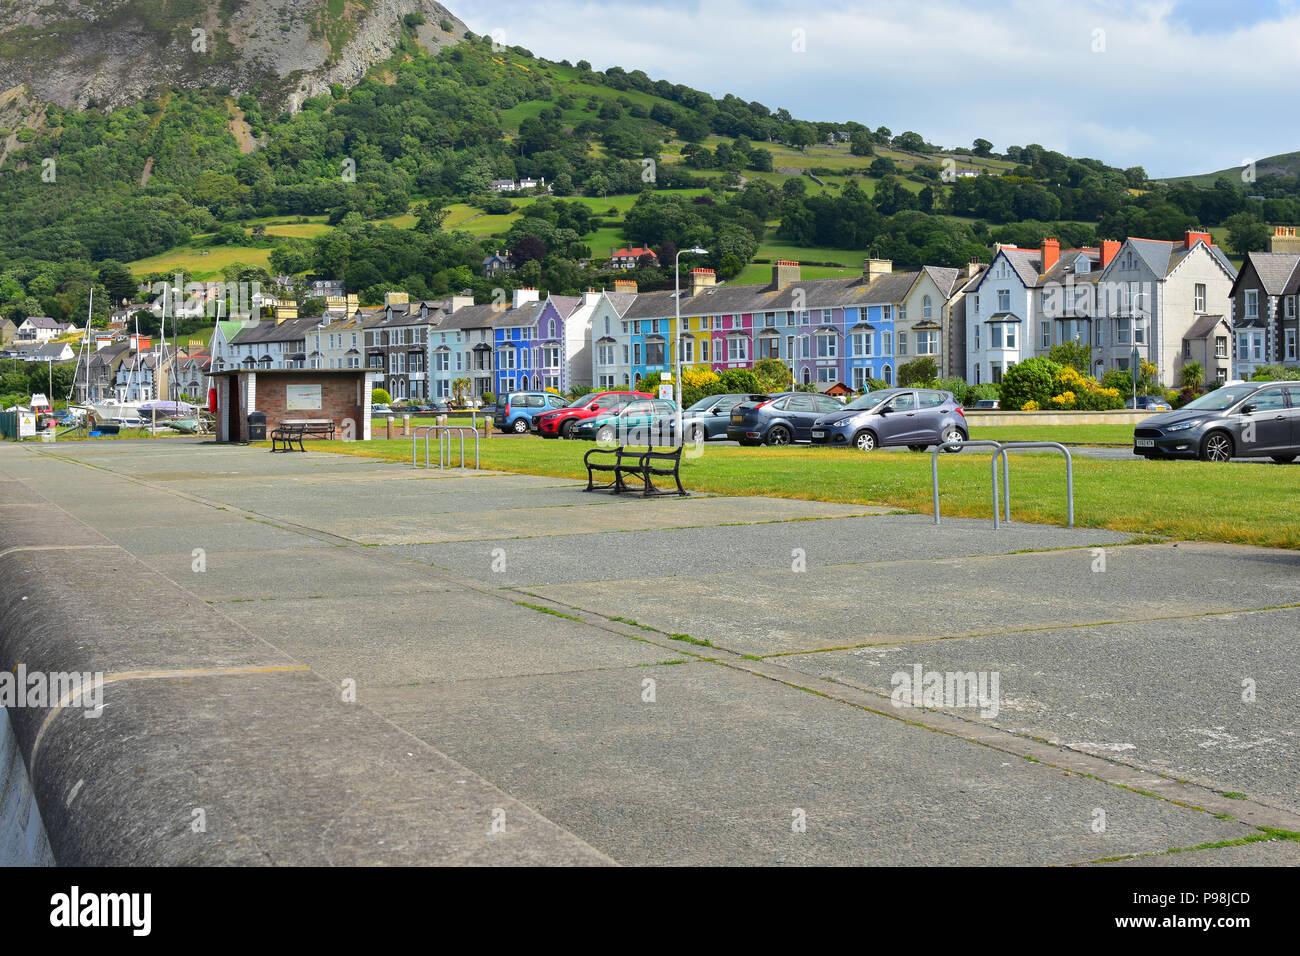 Llanfairfechan promenade, North Wales, UK - Stock Image